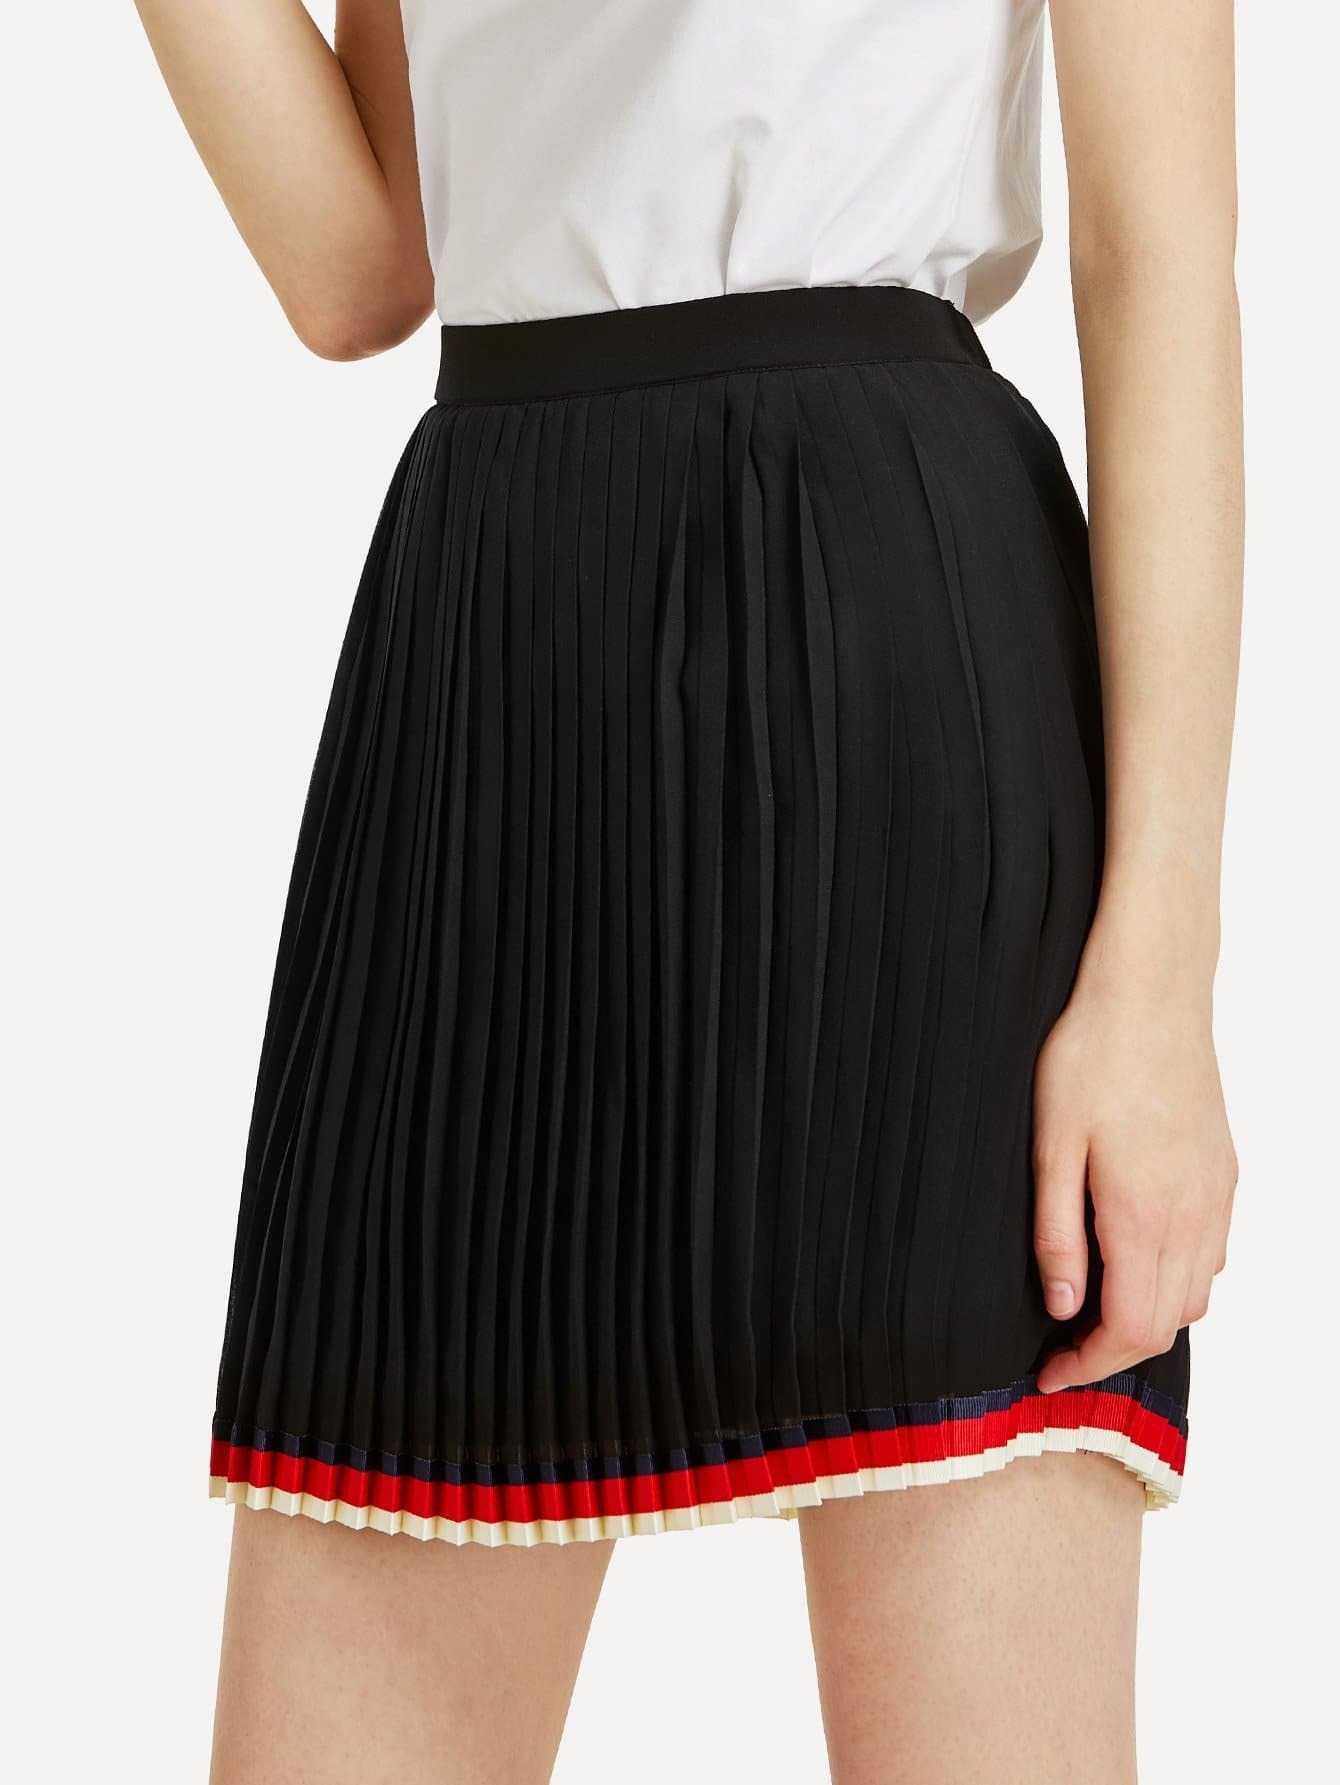 Striped Hem Pleated Skirt multi striped skirt